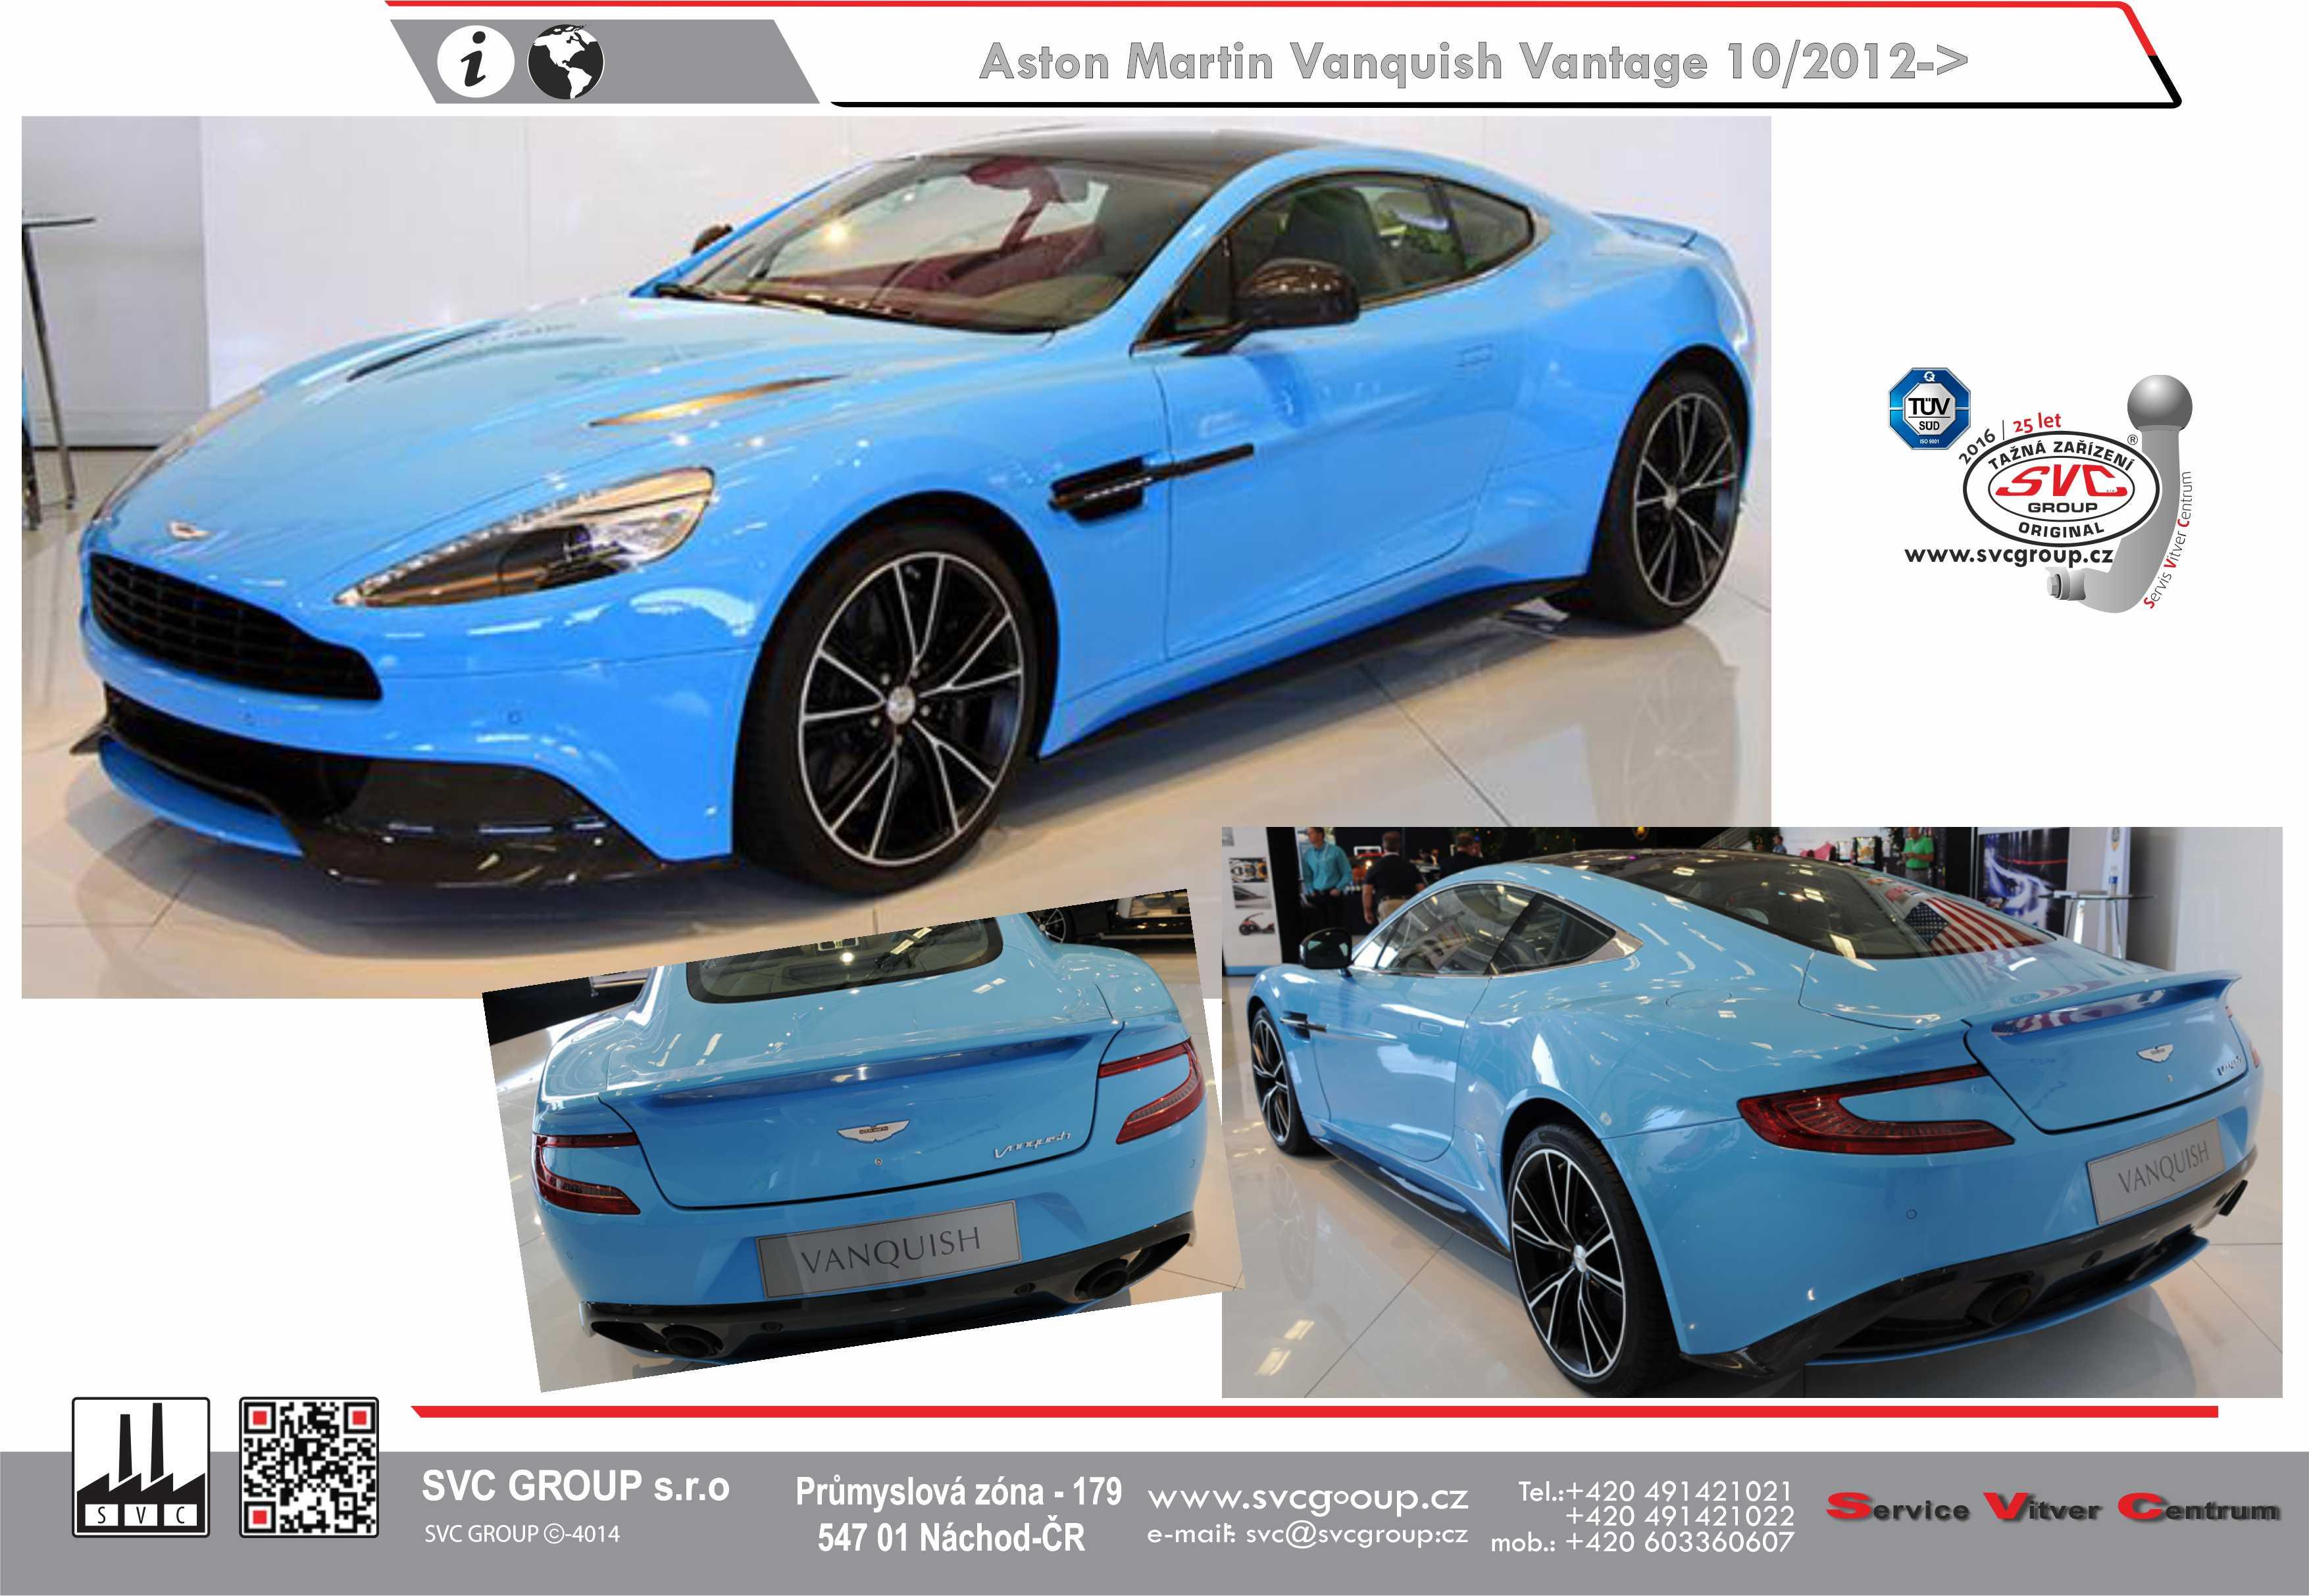 Aston Martin Vanquish Vantage Coupé